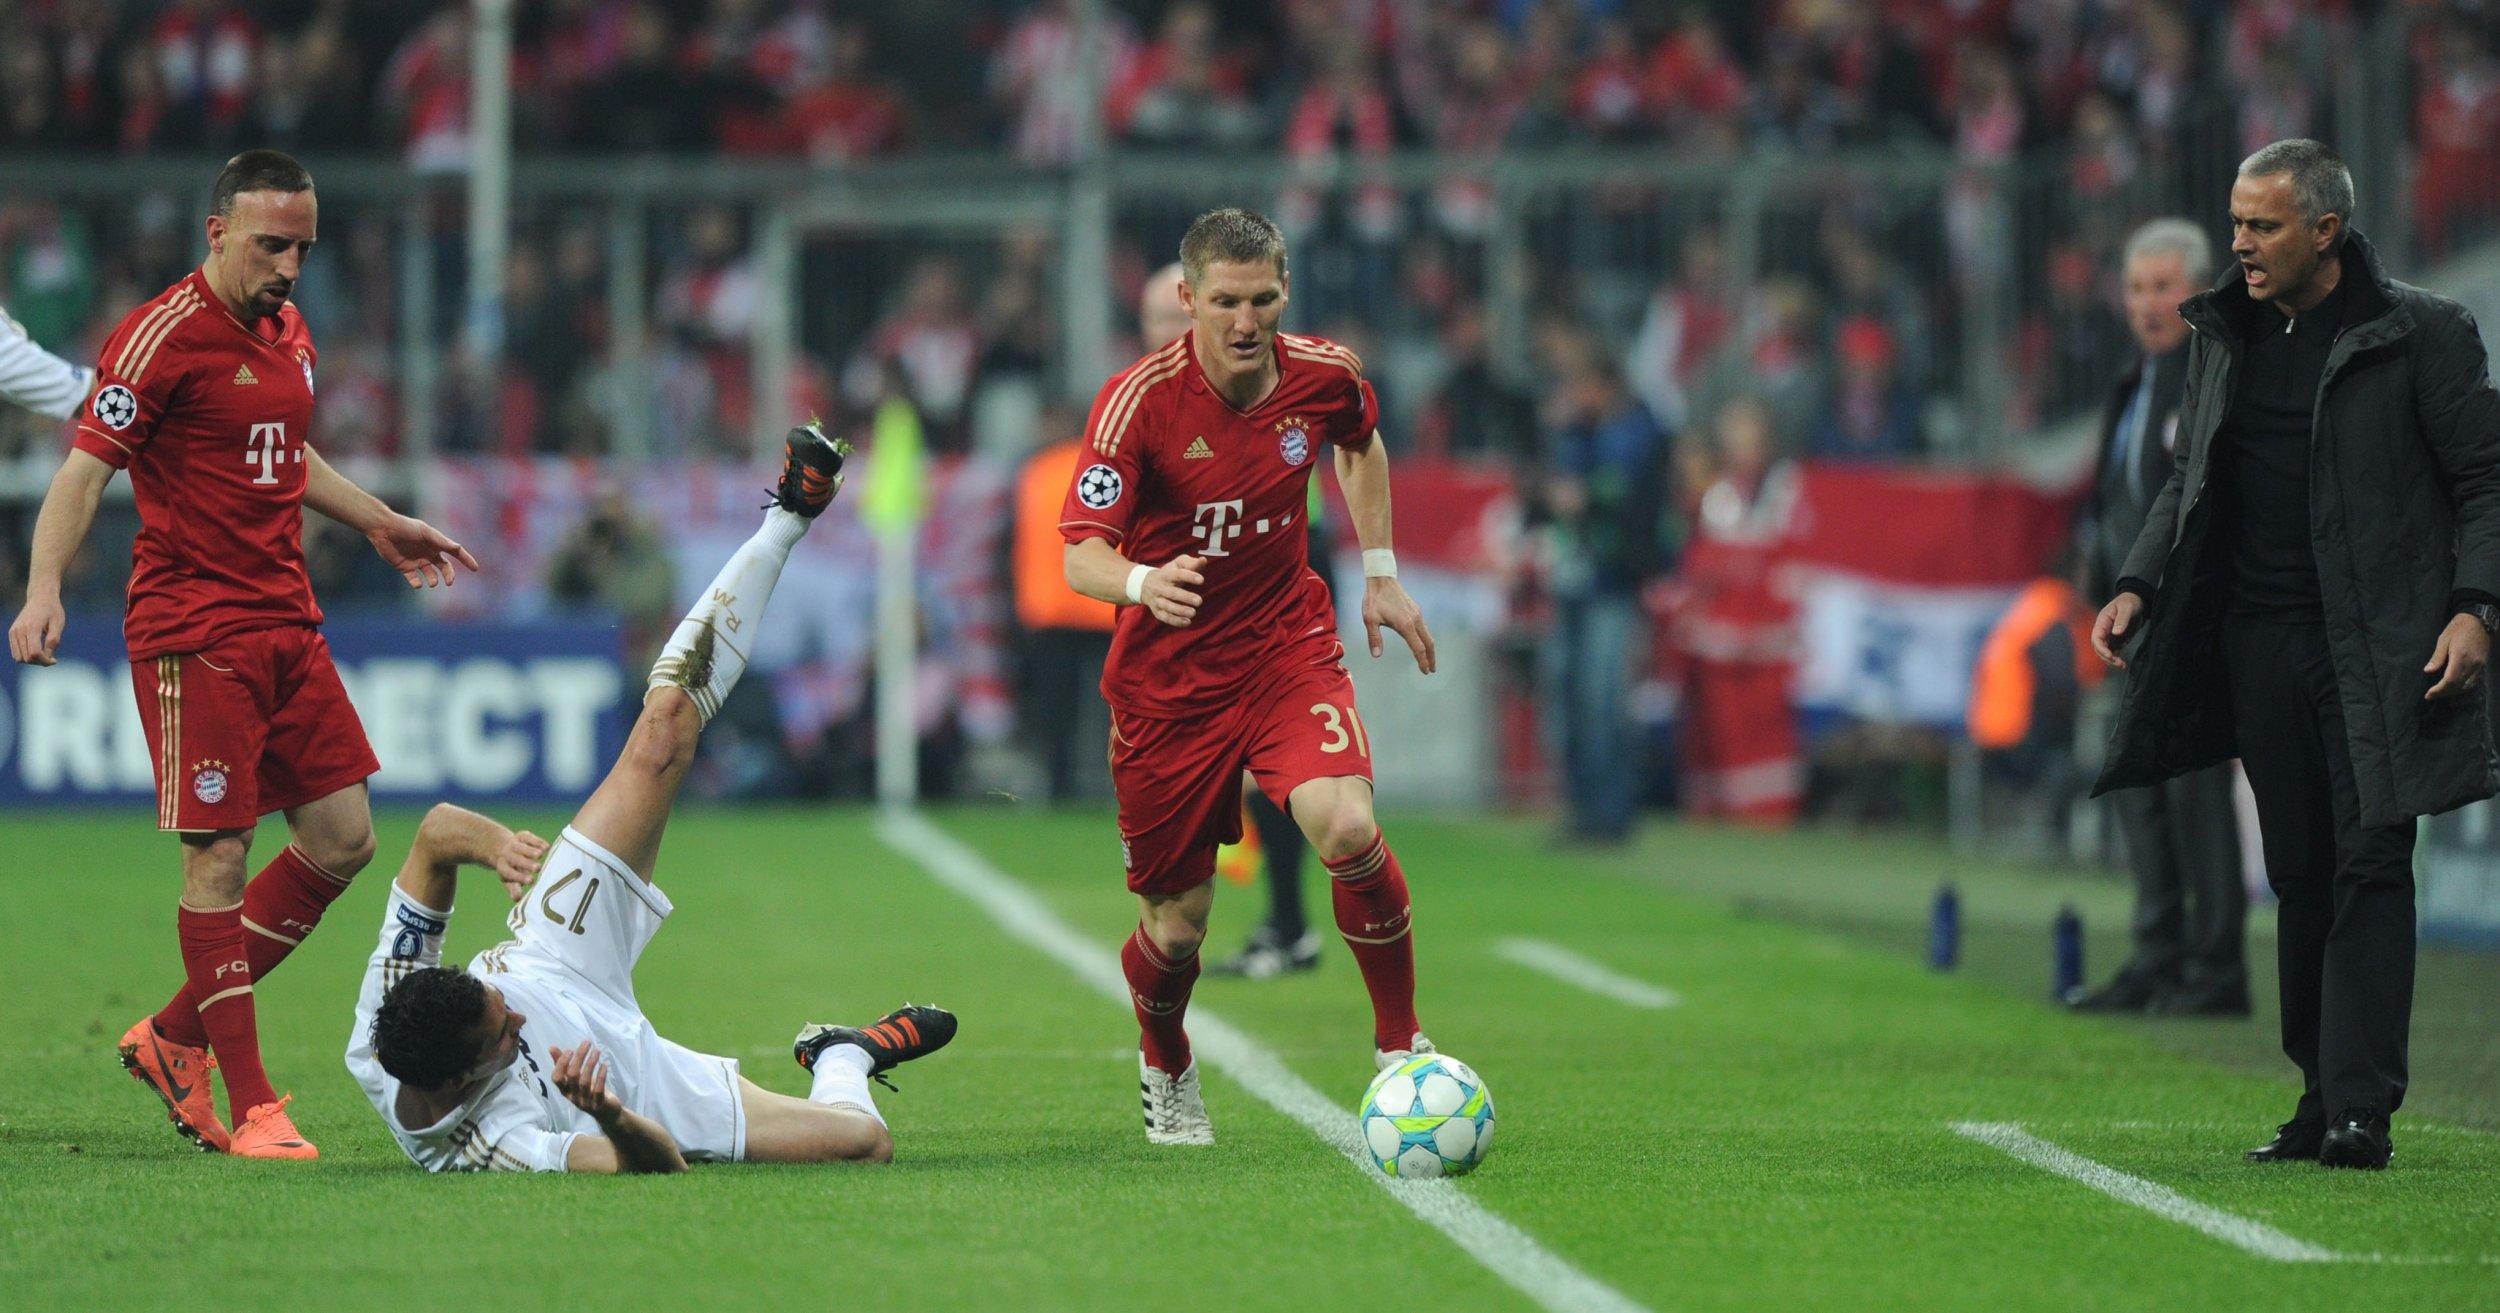 Bastian Schweinsteiger, center, with Jose Mourinho, right.